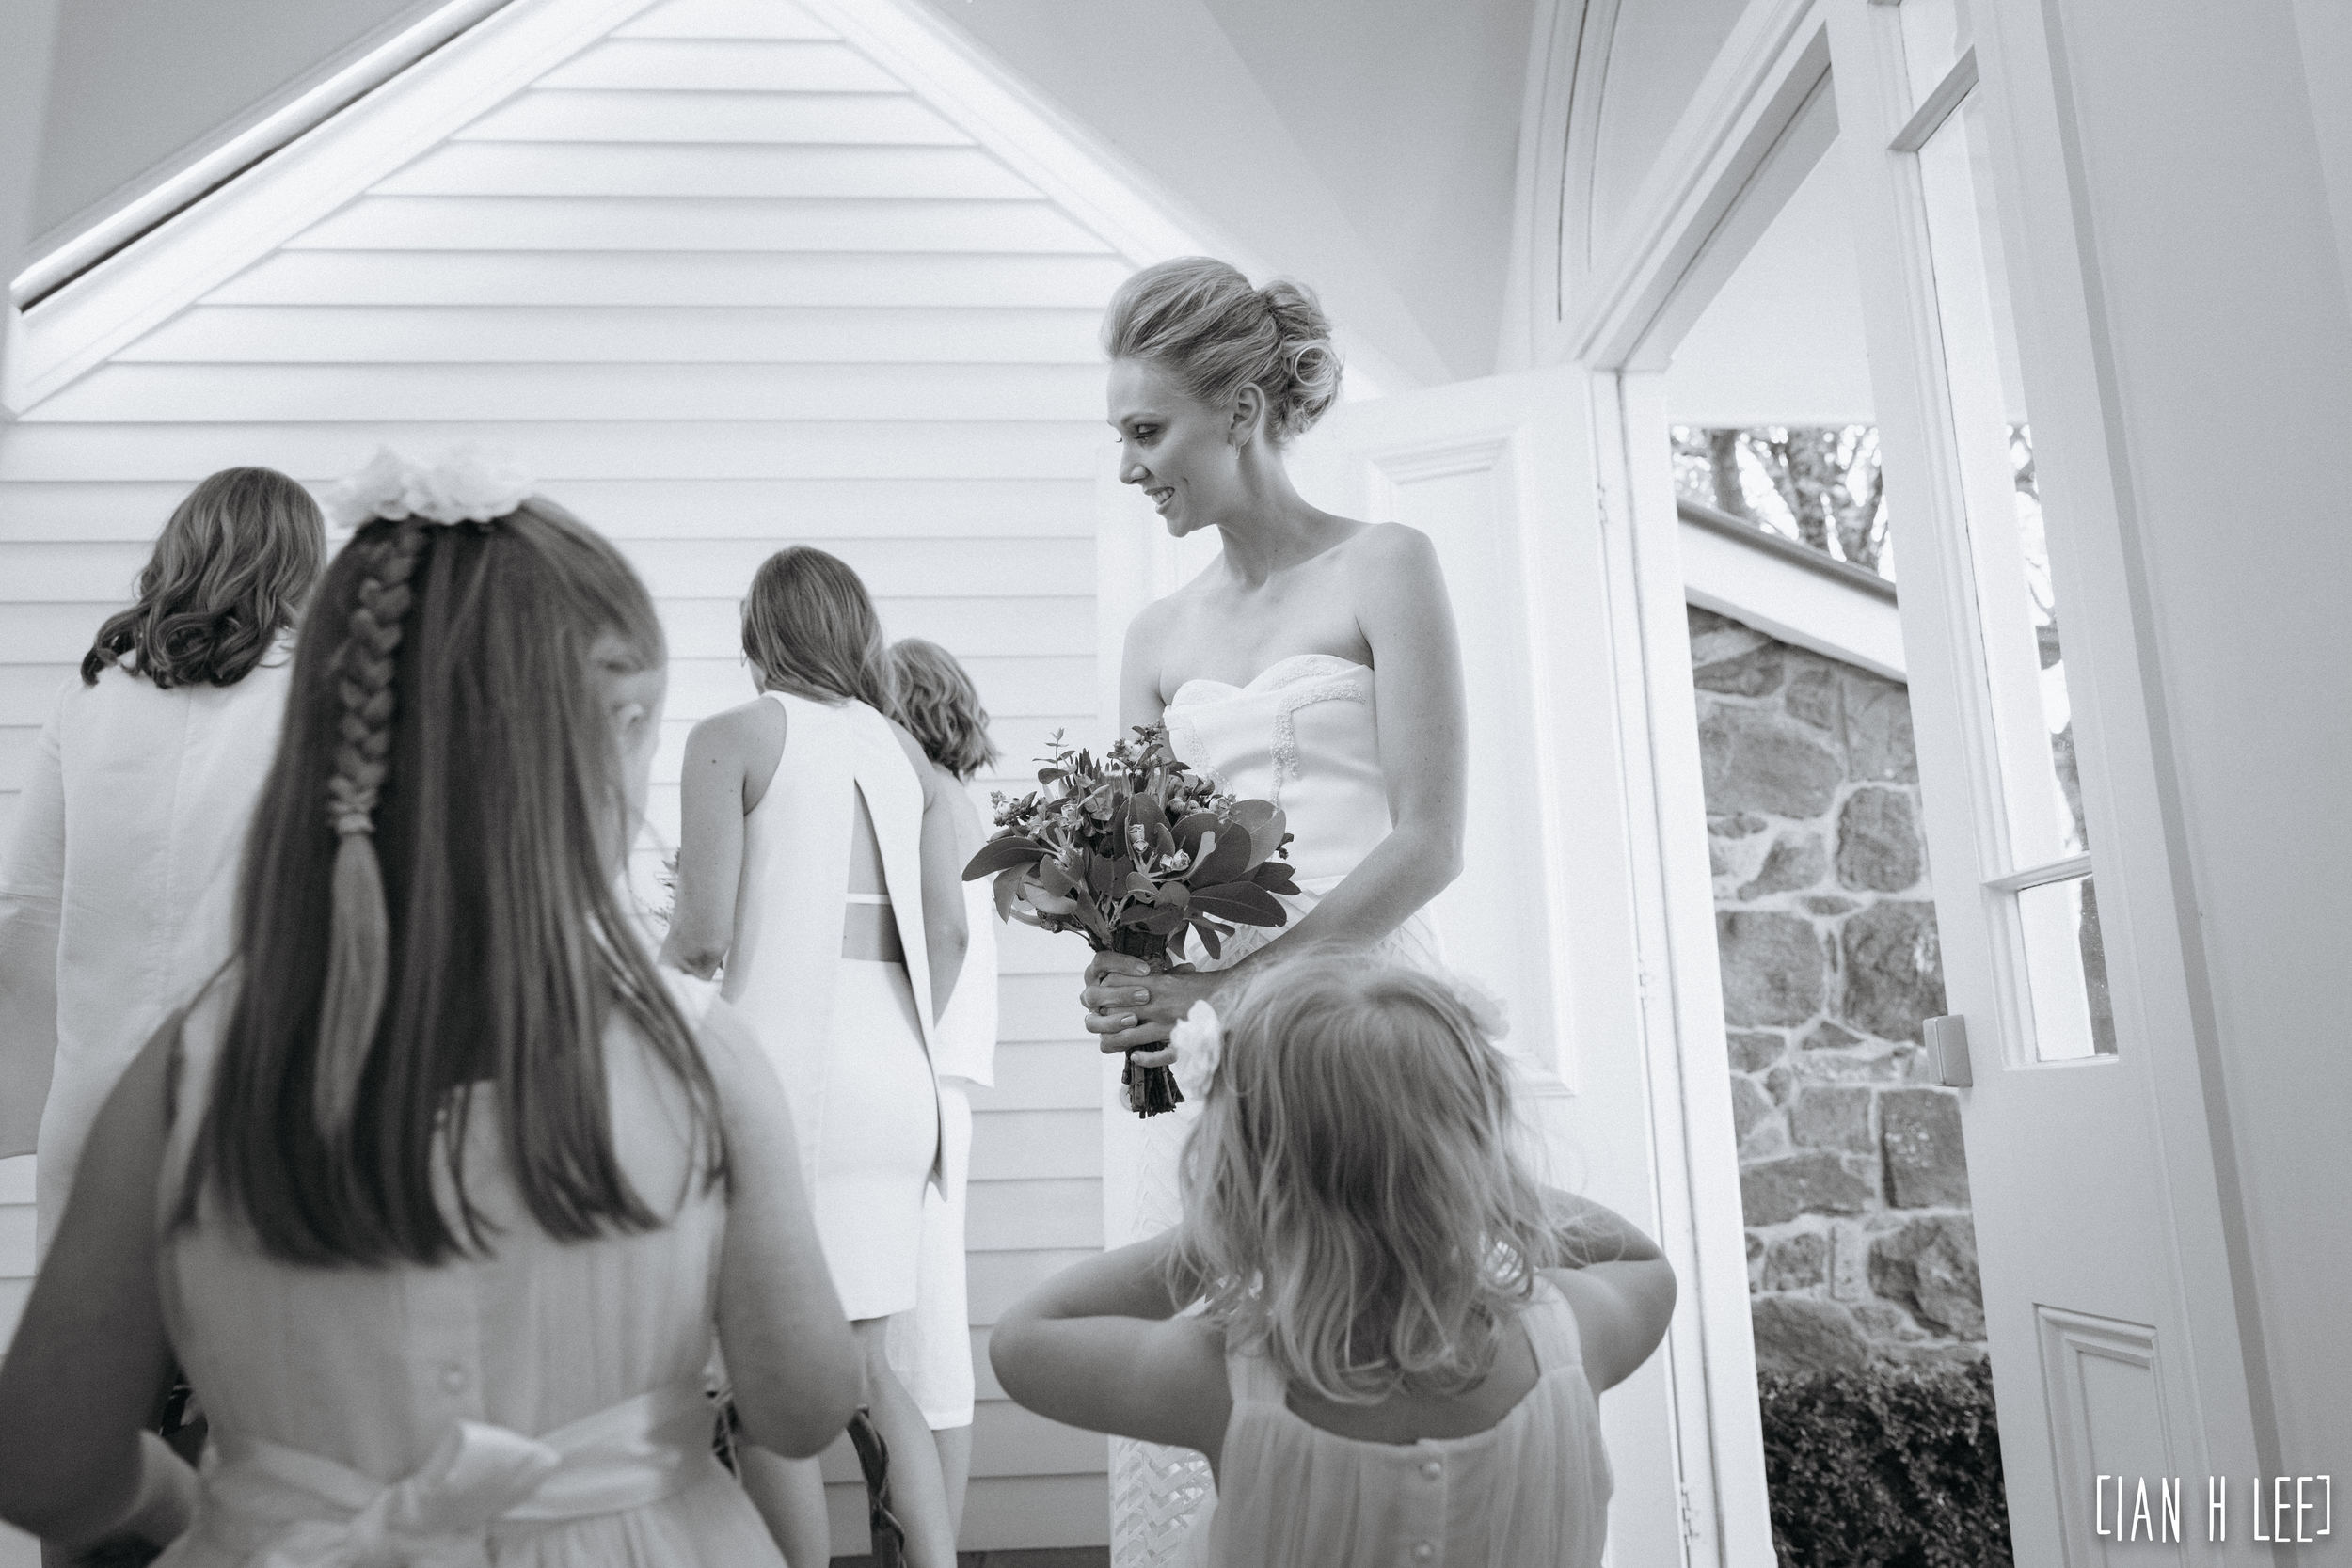 [Ian H Lee] Photography || Weddings - Melbourne || Ewan And Courtney -9384.jpg